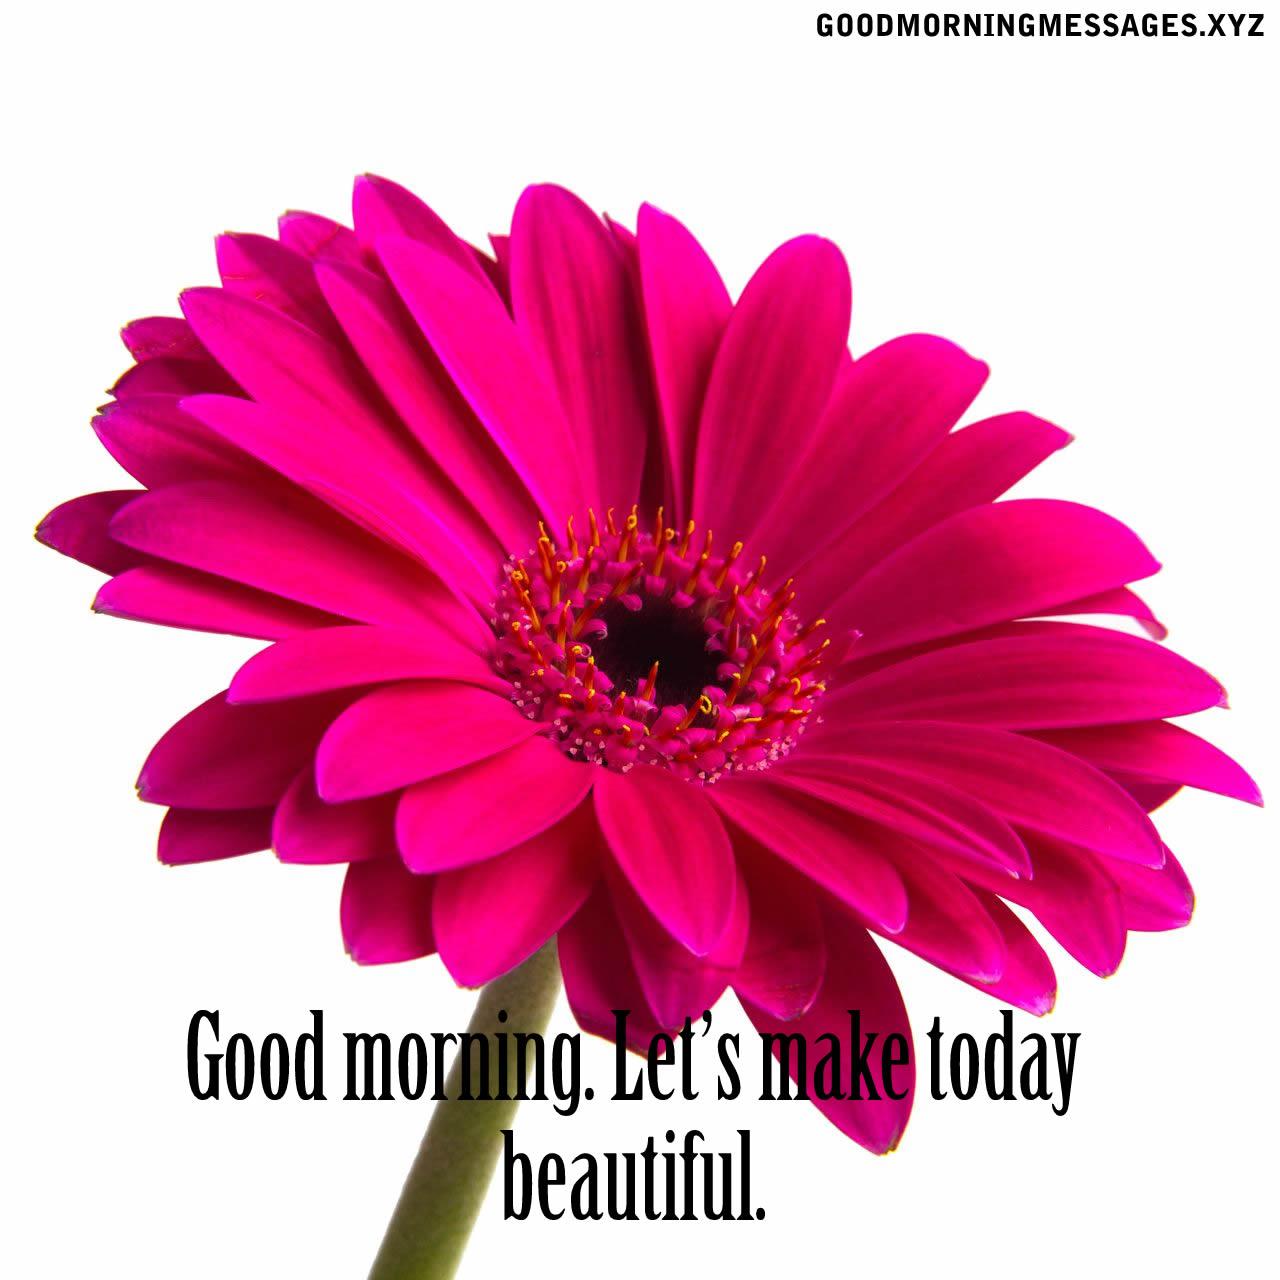 Good morning Lets make today beautiful